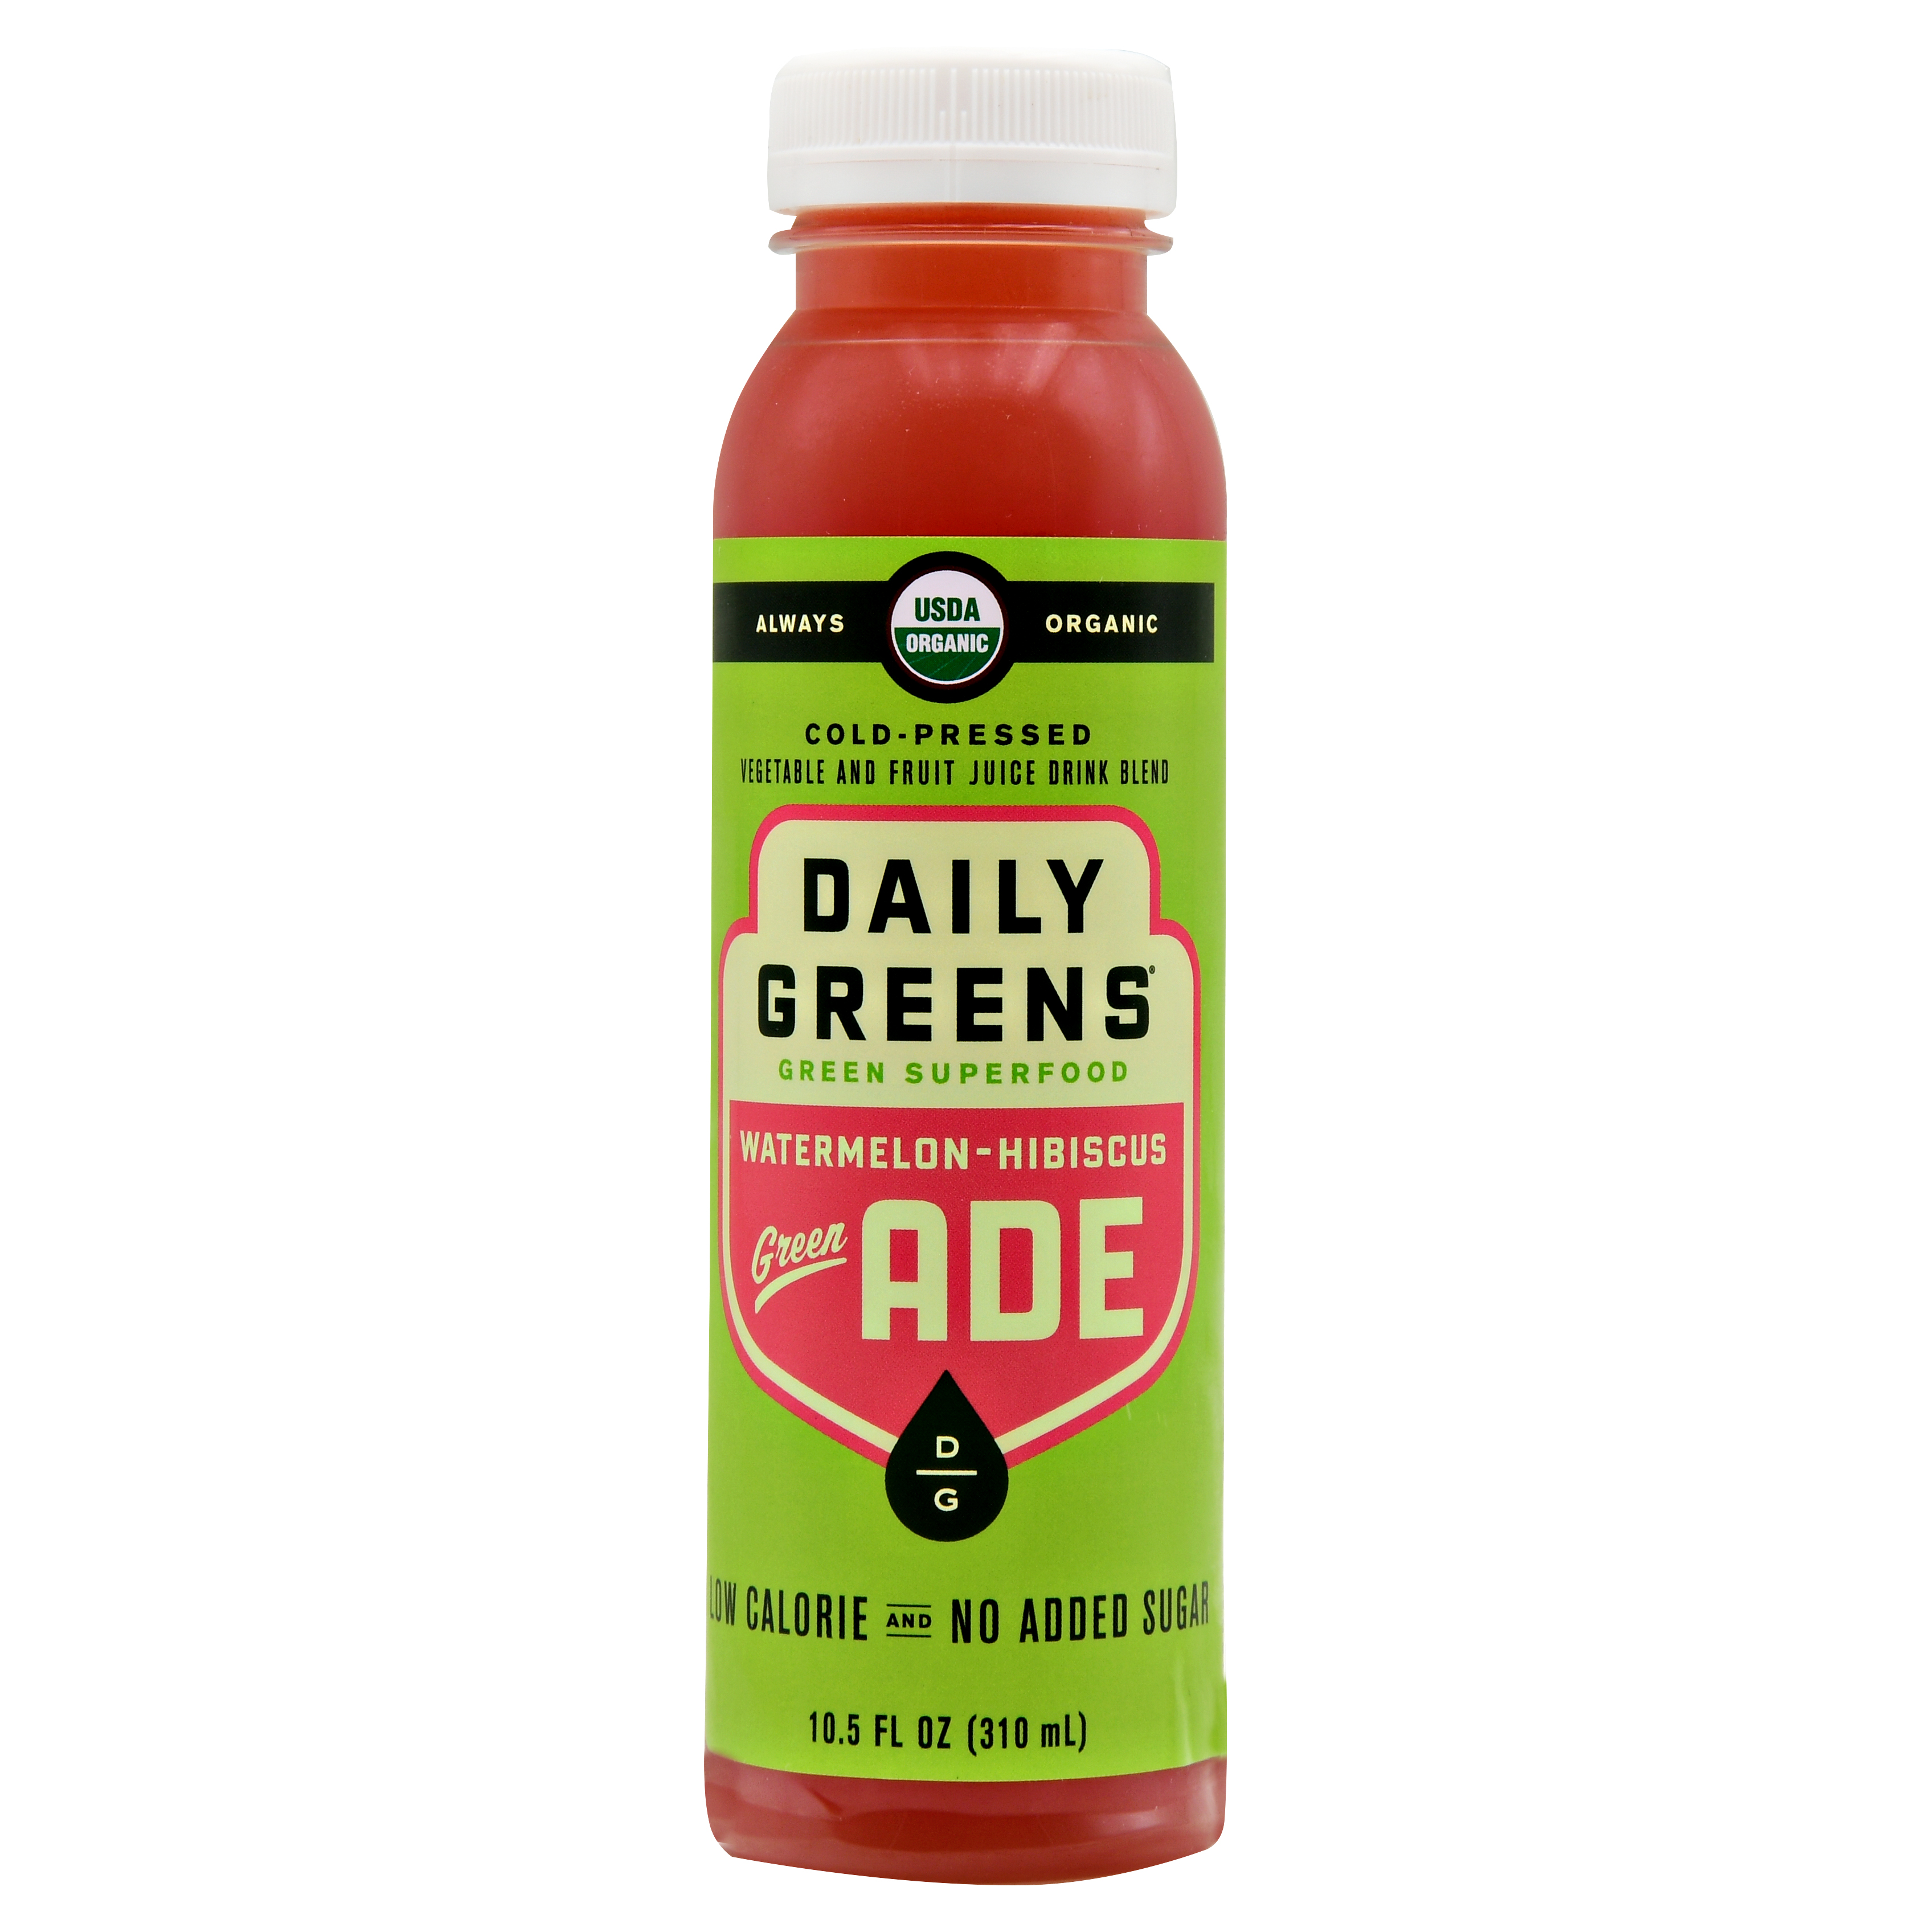 Watermelon-Hibiscus Green-Ade: Drink Daily Greens Organic Green-Ade 10.5oz